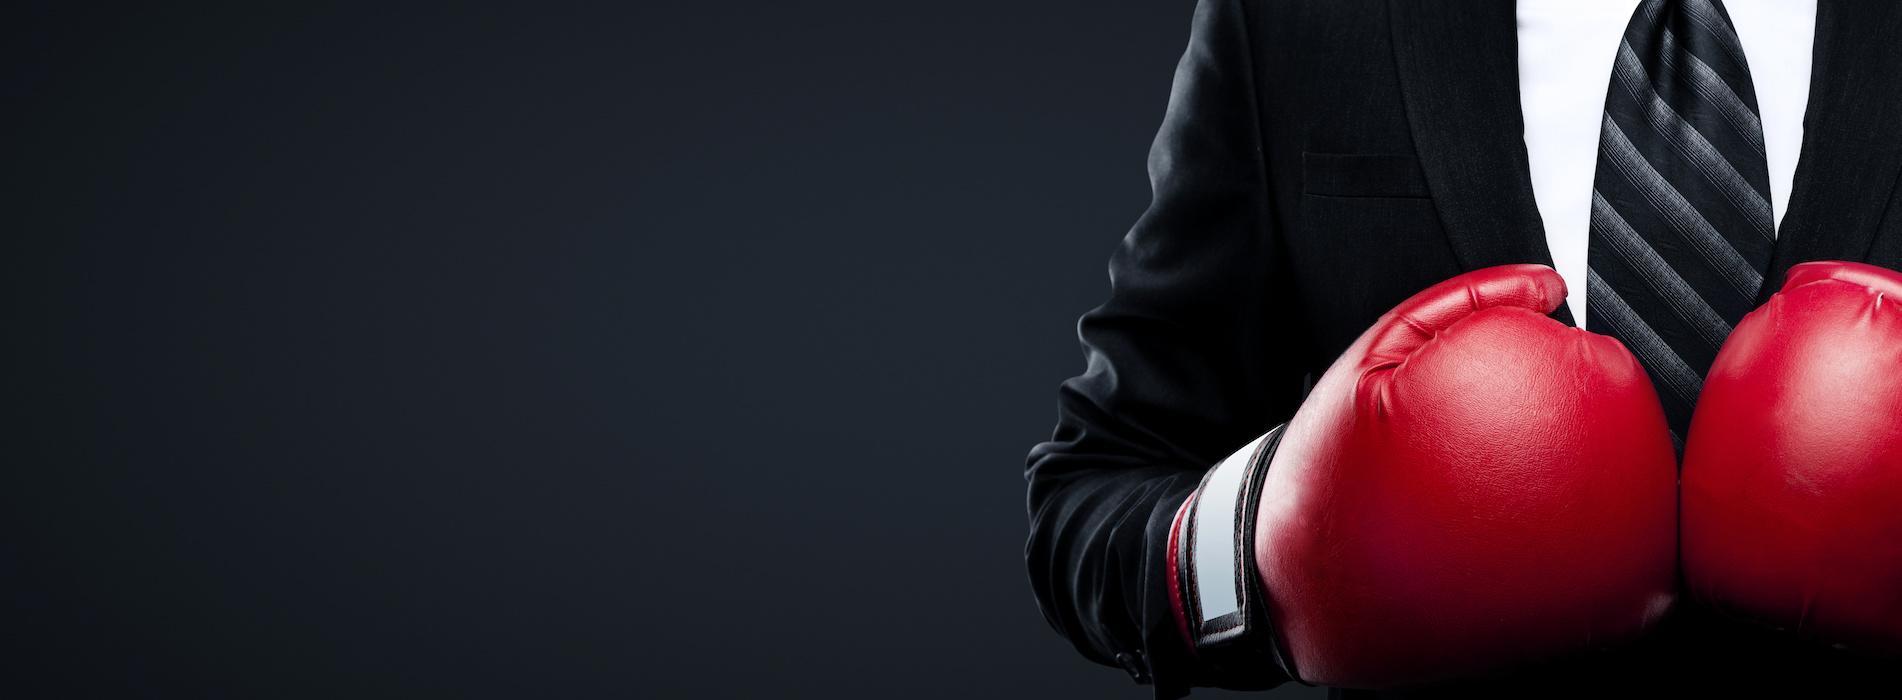 Aufmischen-Boxhandschuhe Kopie